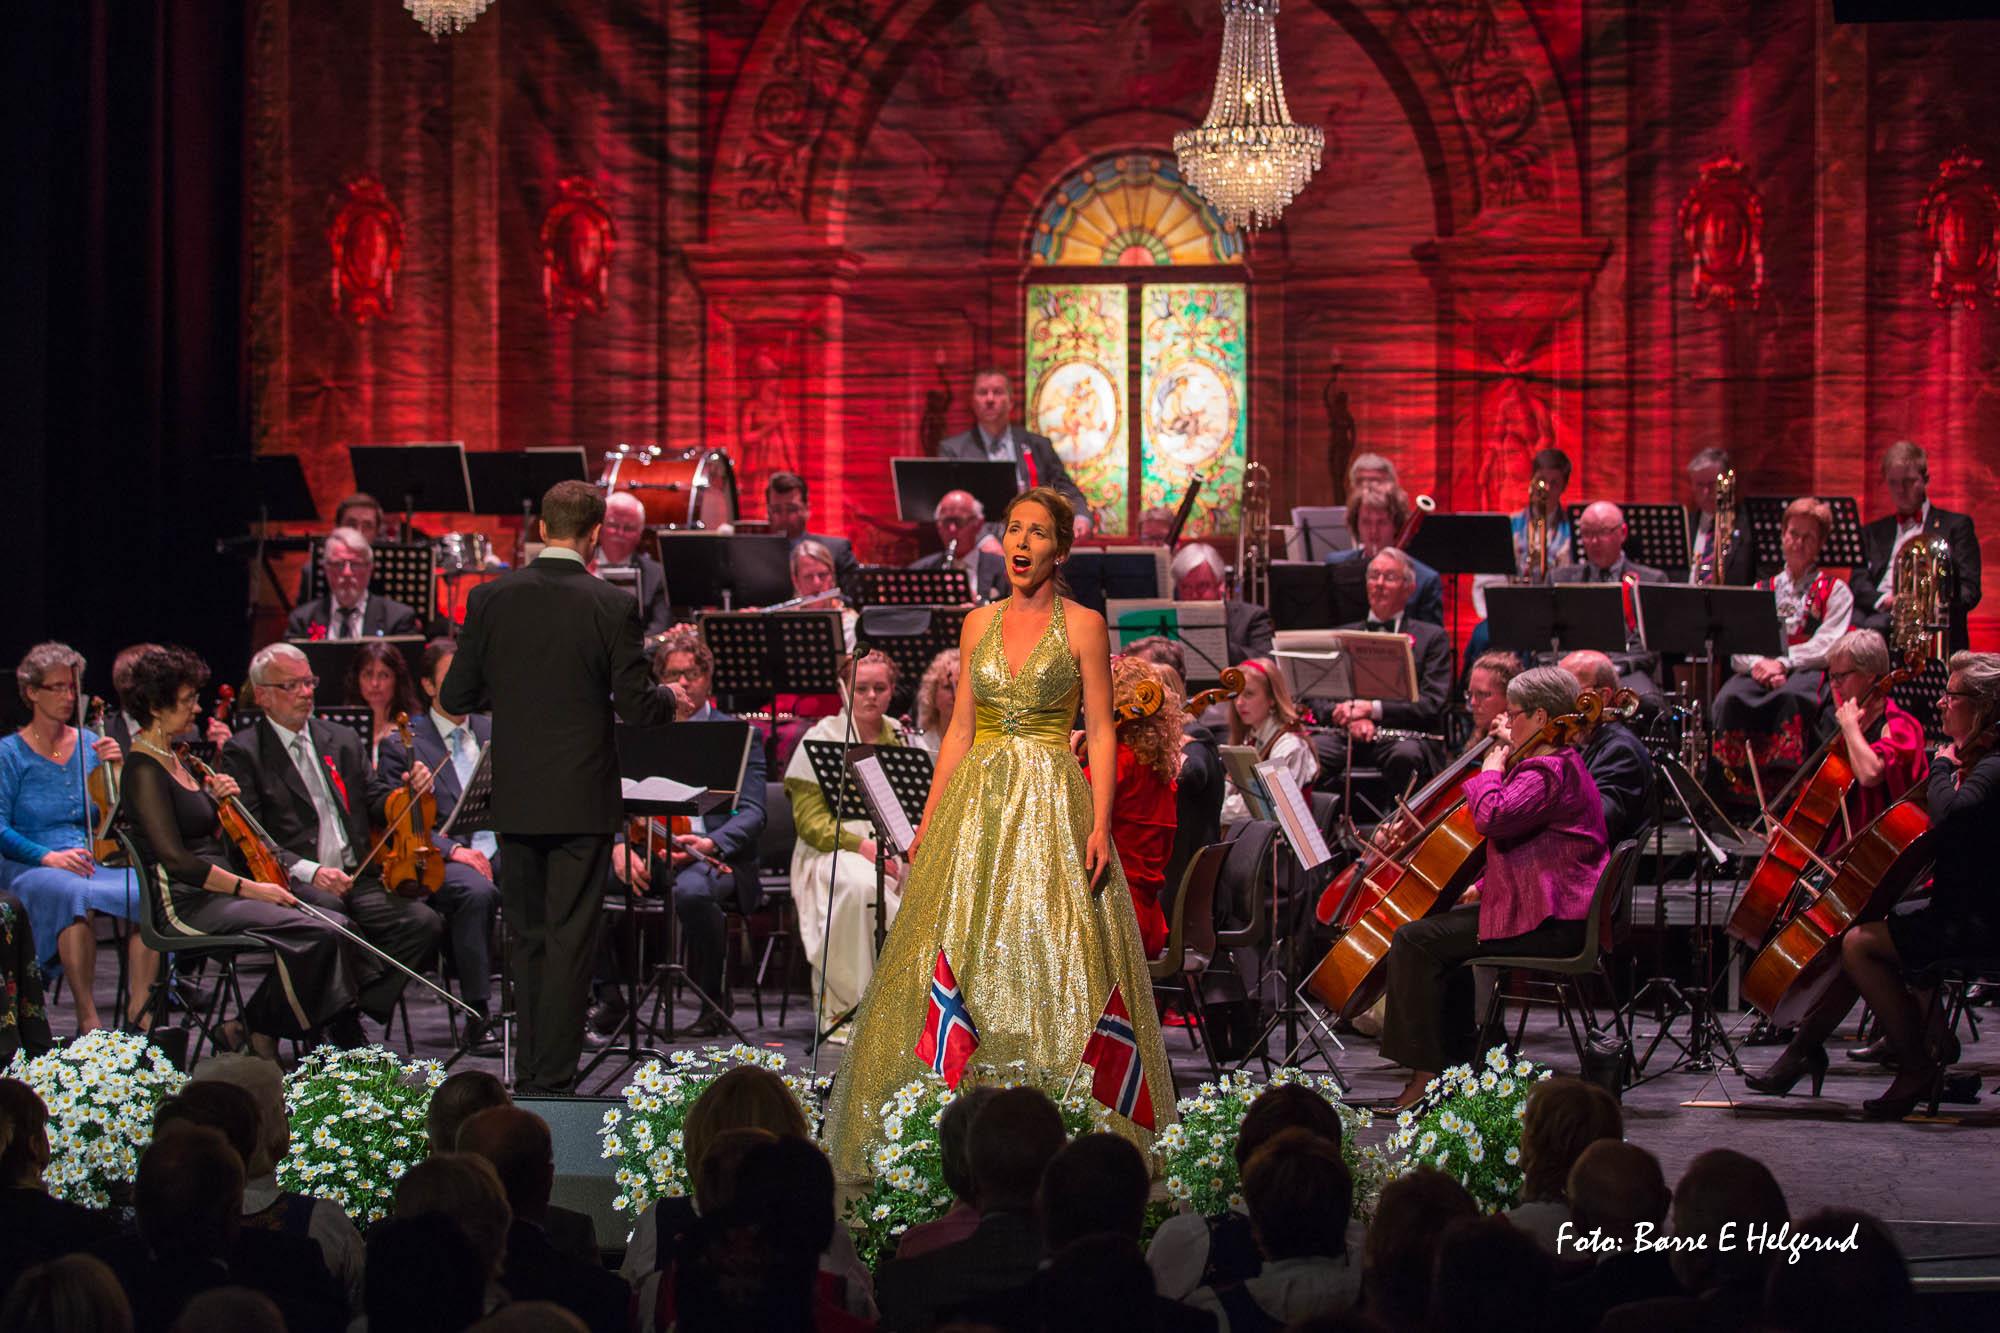 symfoniorkestre i norge